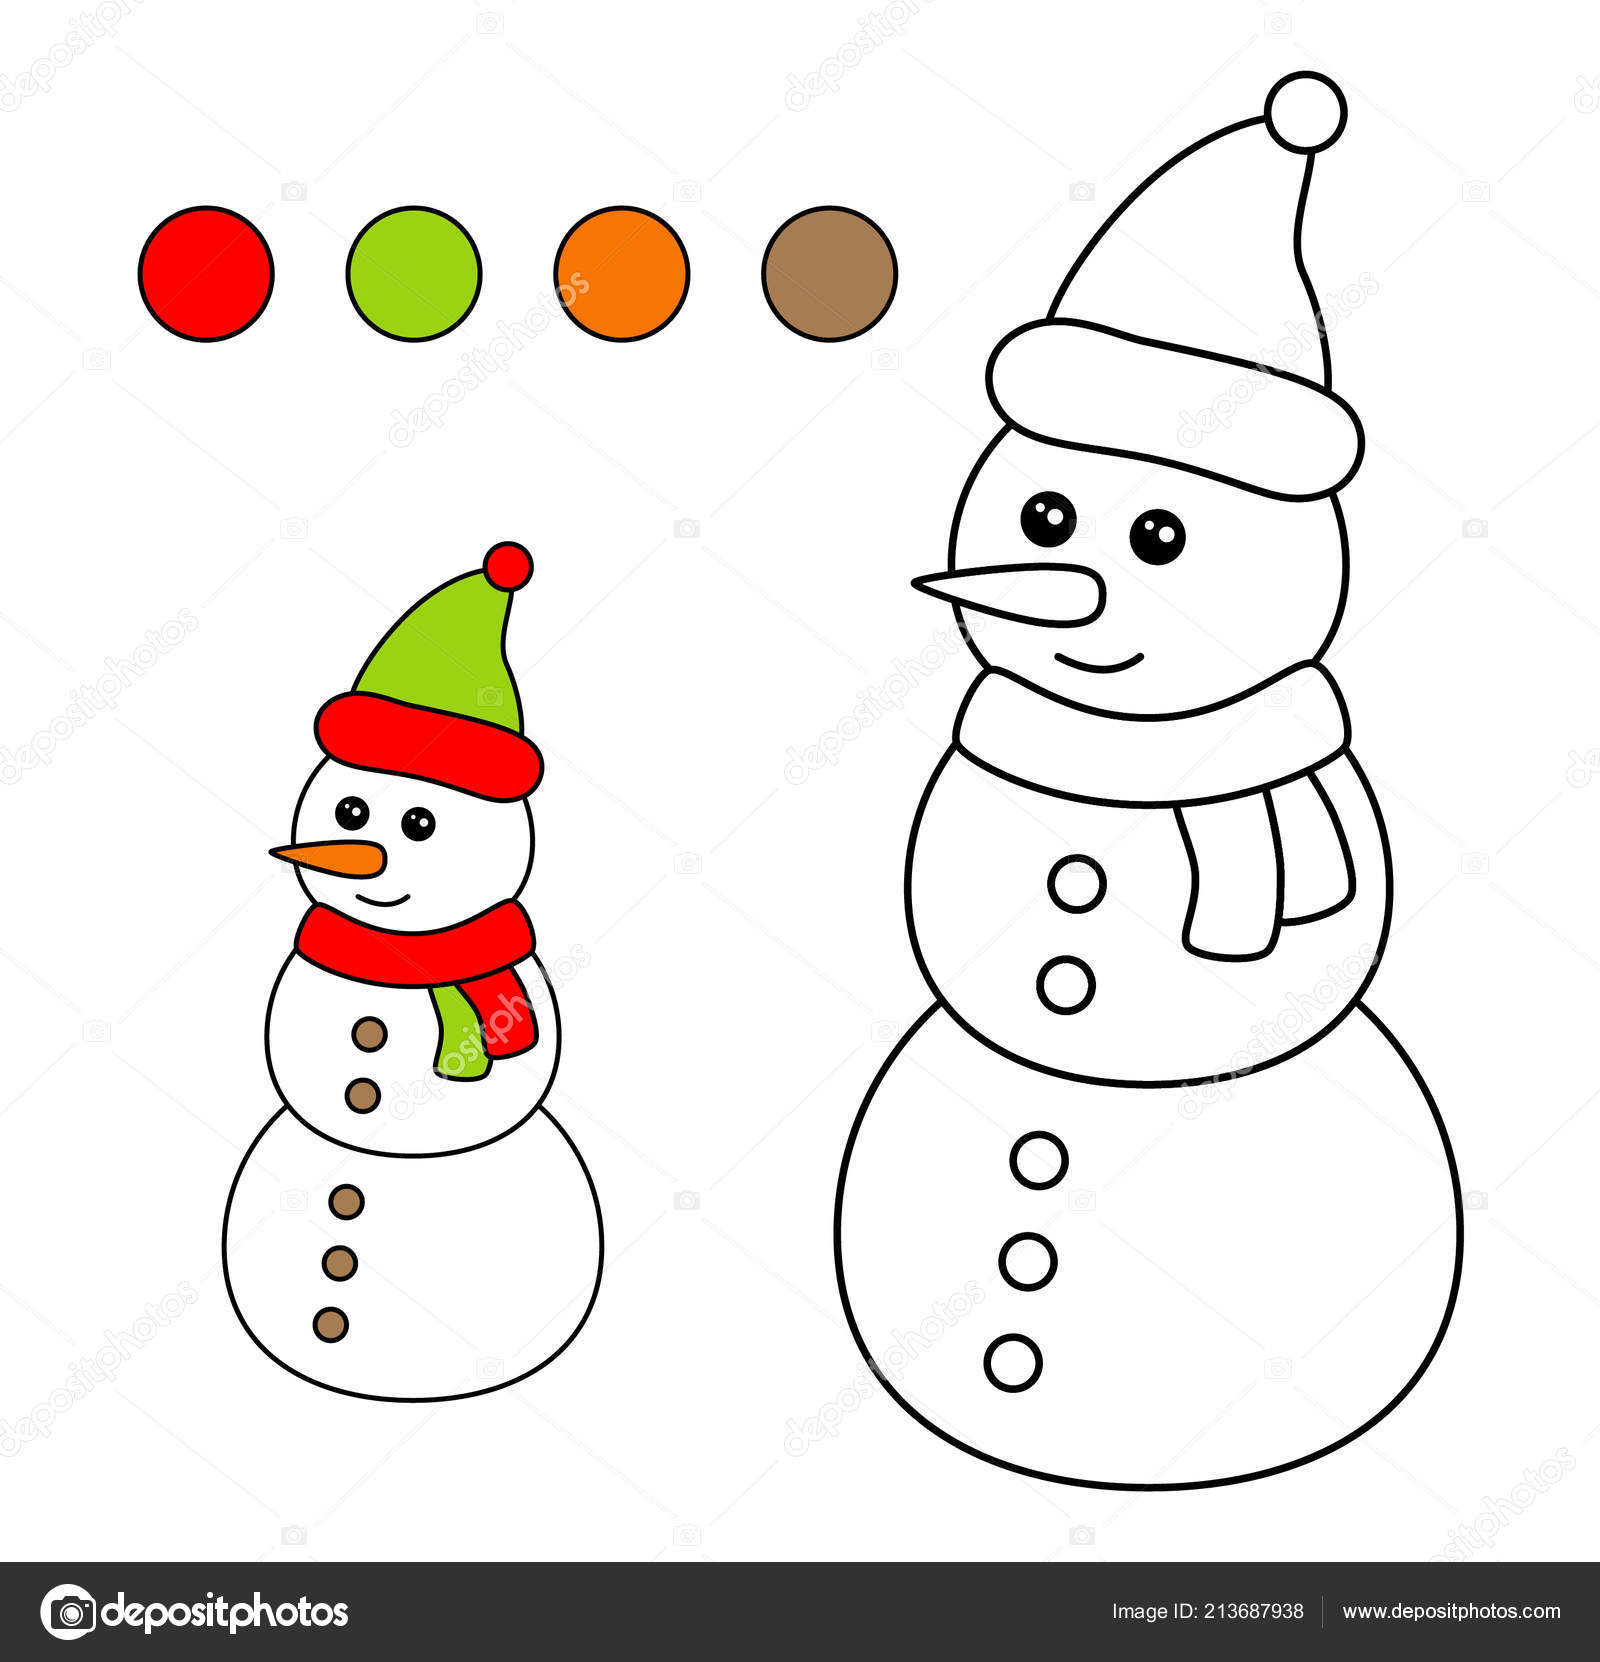 Coloring Book Children Drawing Kids Activity Christmas Snowman Stock Vector C Kalinicheva Maria Mail Ru 213687938